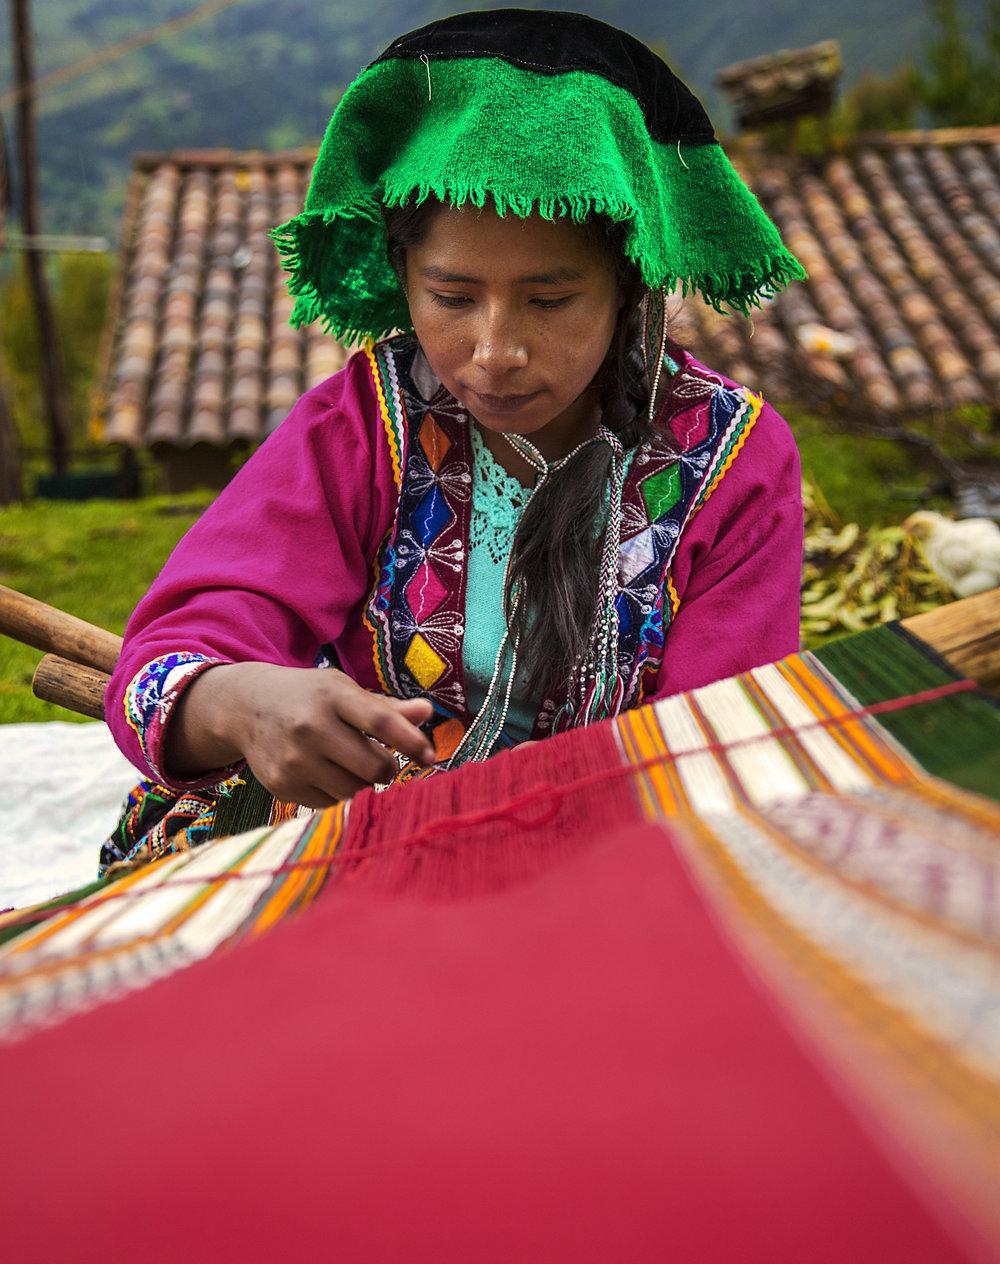 Simon+Needham+Humanitarian+Photography+Peru+24.jpg